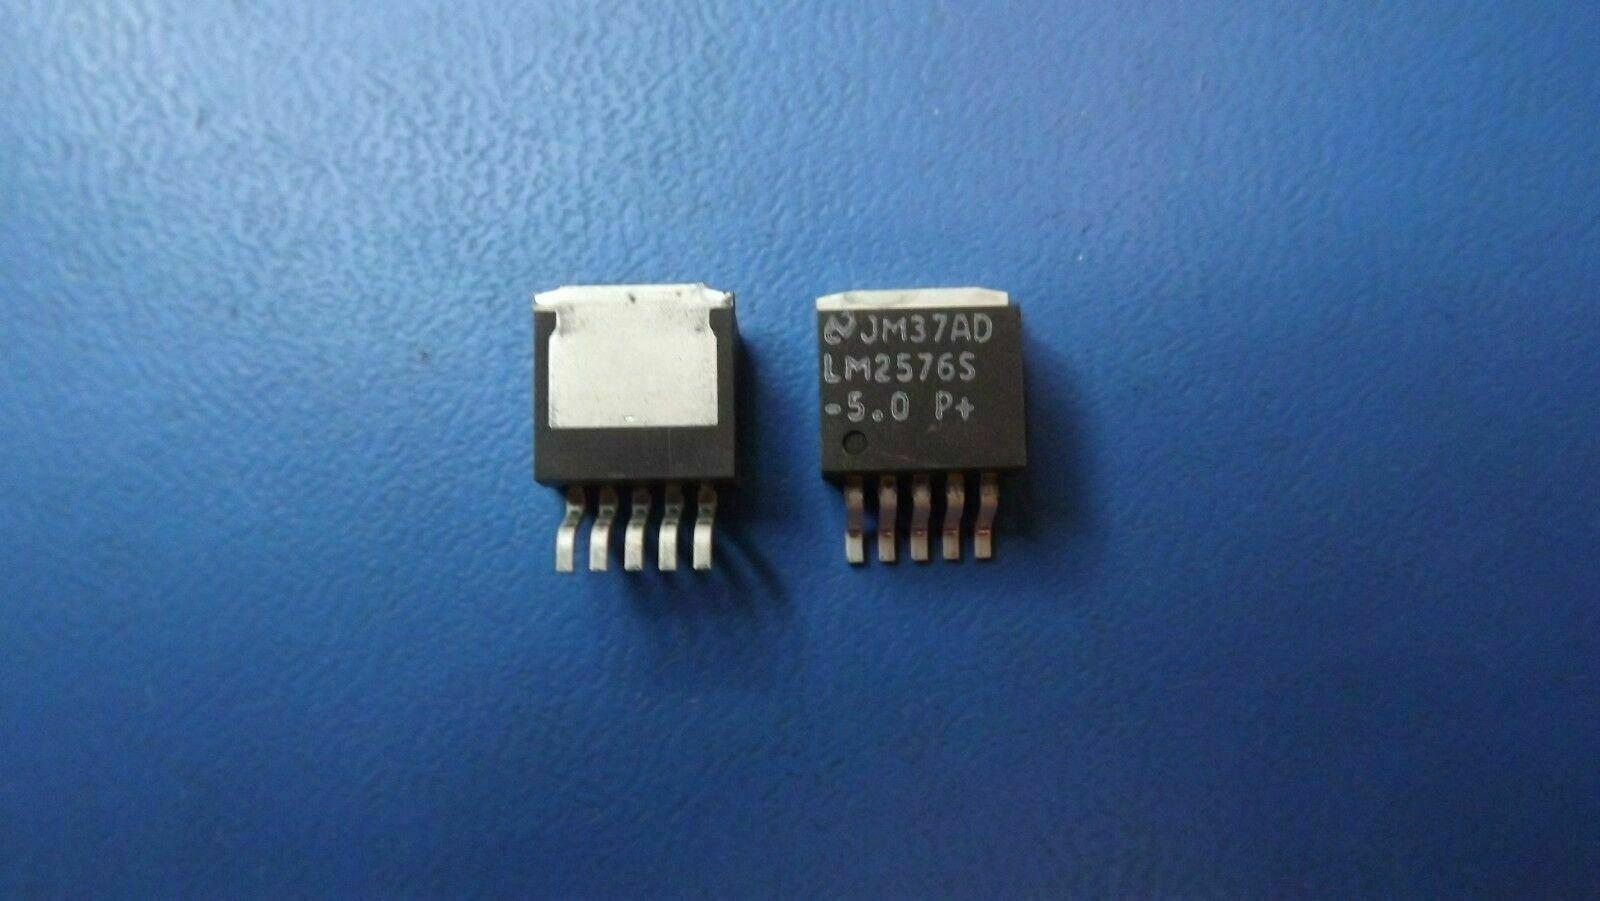 LM2576S-3.3  Texas  Schaltregler  3A  3,3V   TO263-5  NEW  #BP 1 pc